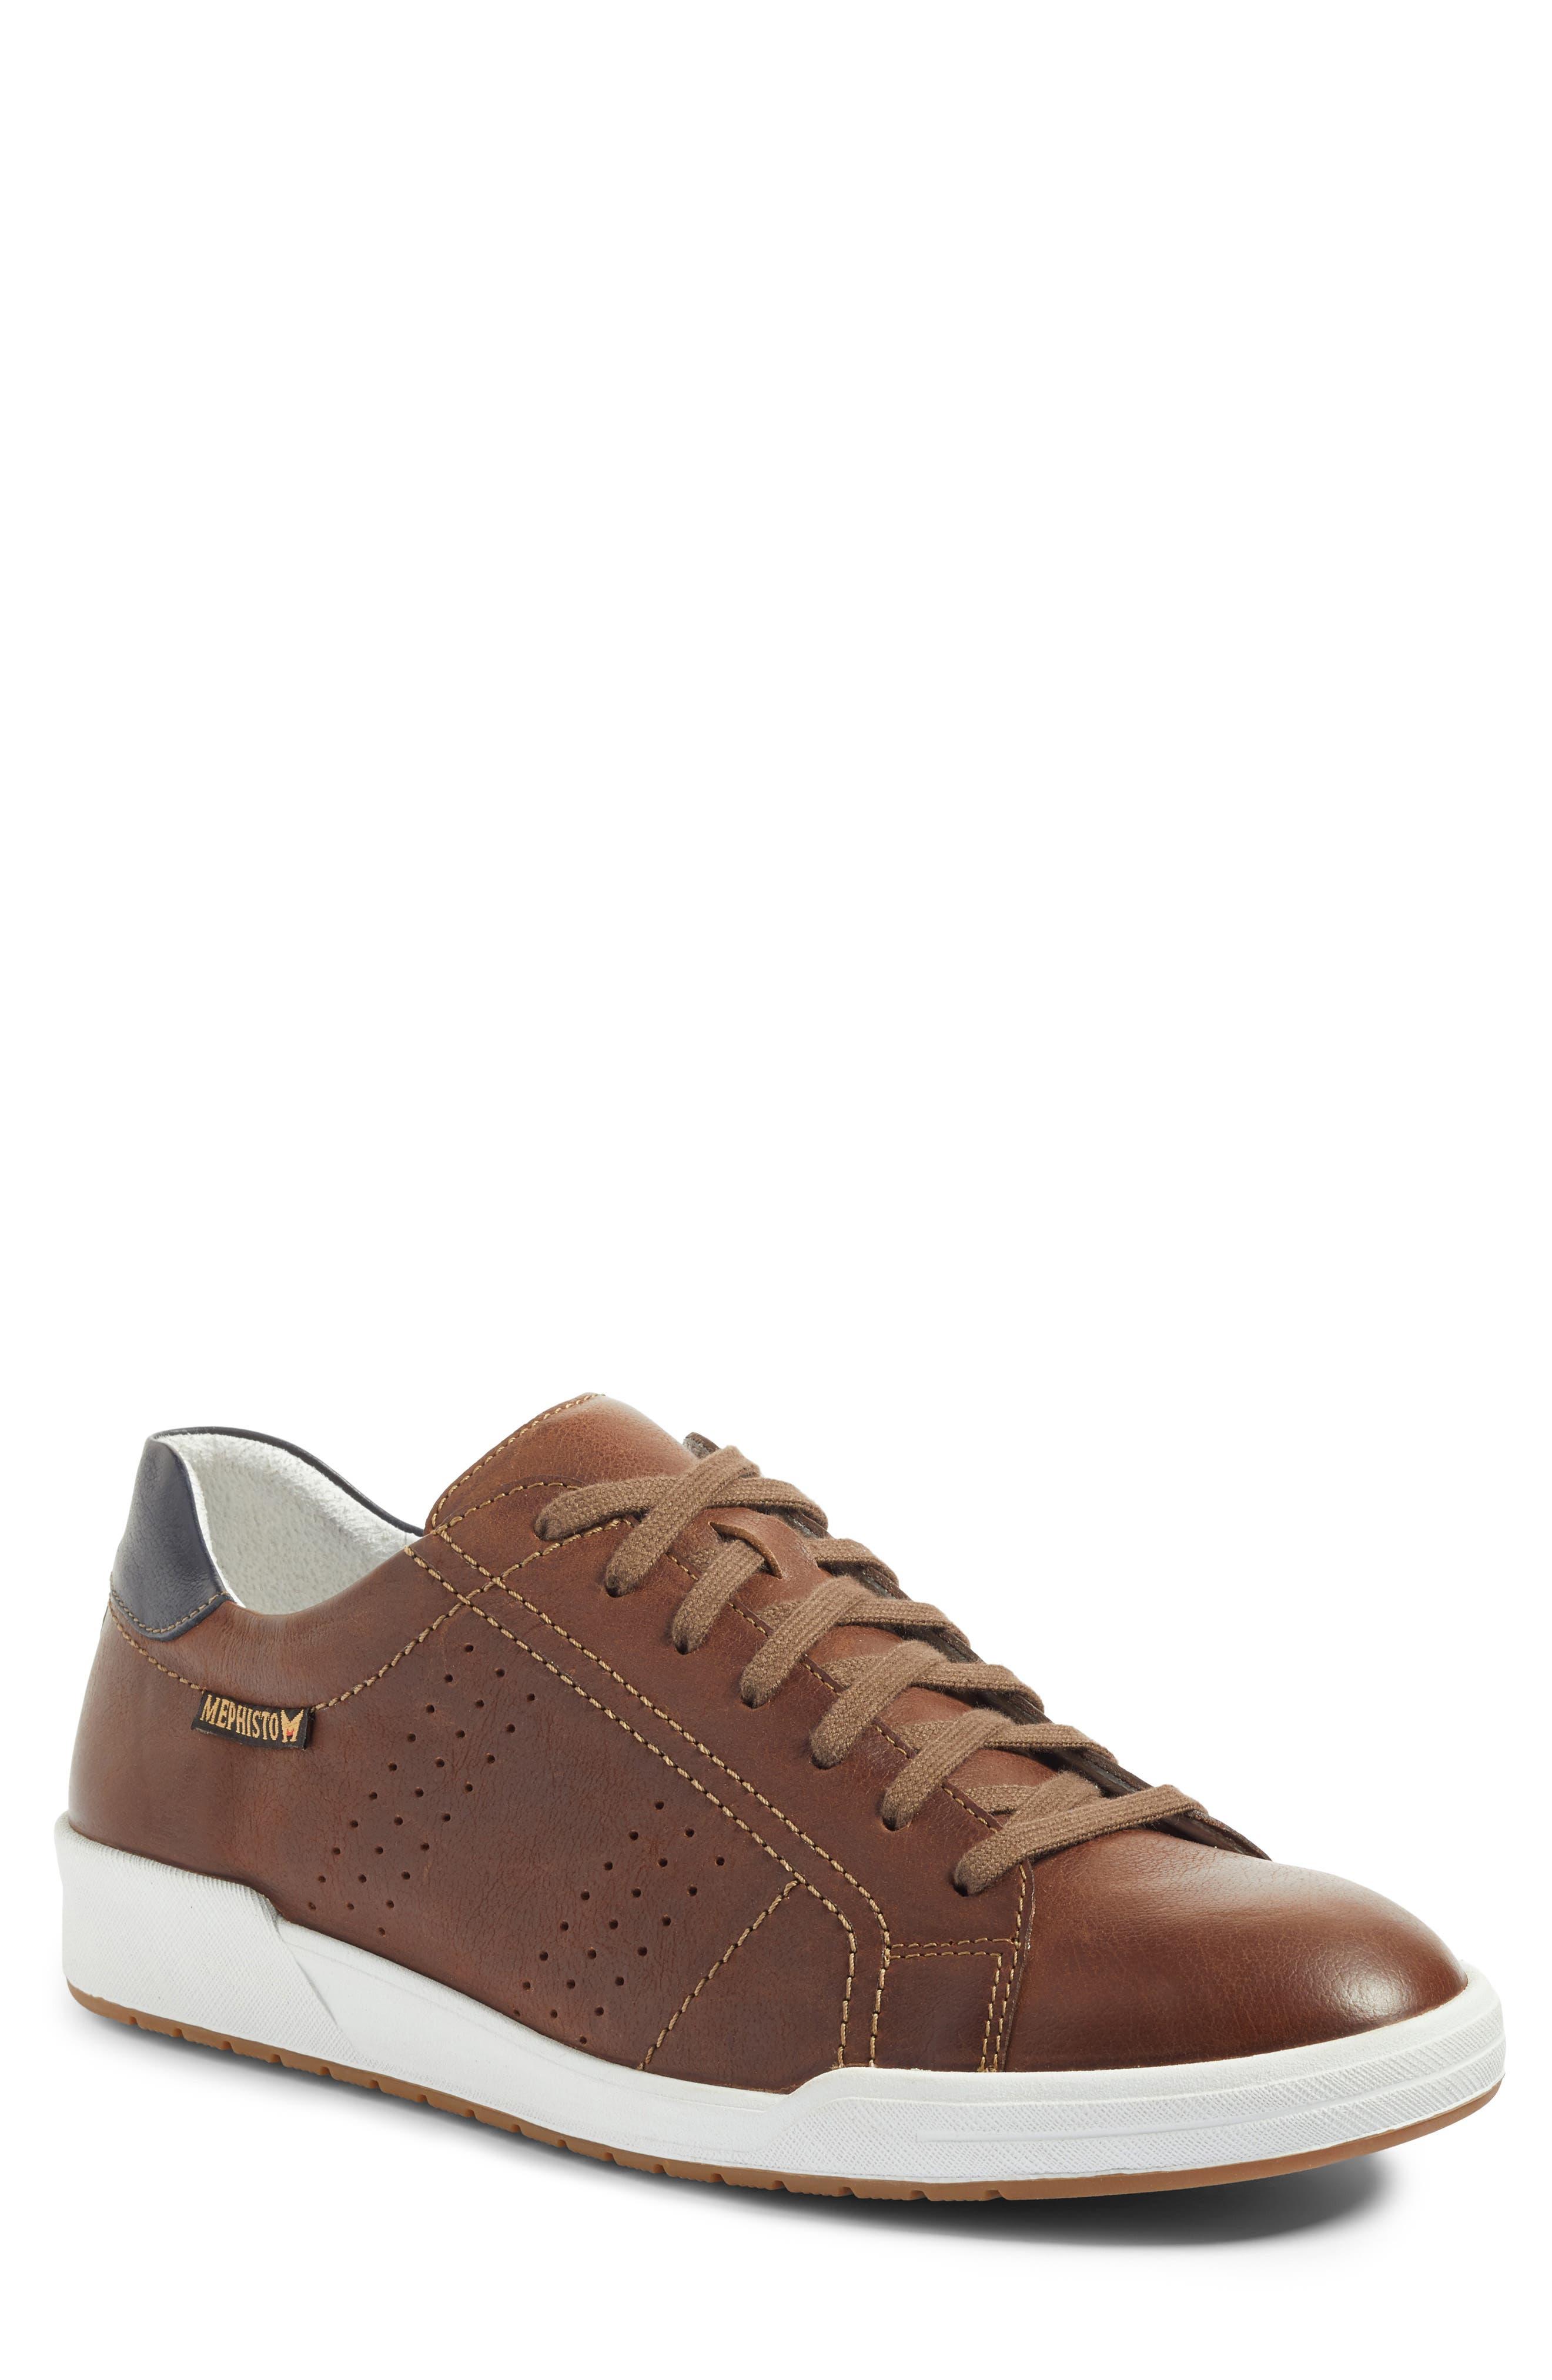 MEPHISTO,                             Rufo Sneaker,                             Main thumbnail 1, color,                             217